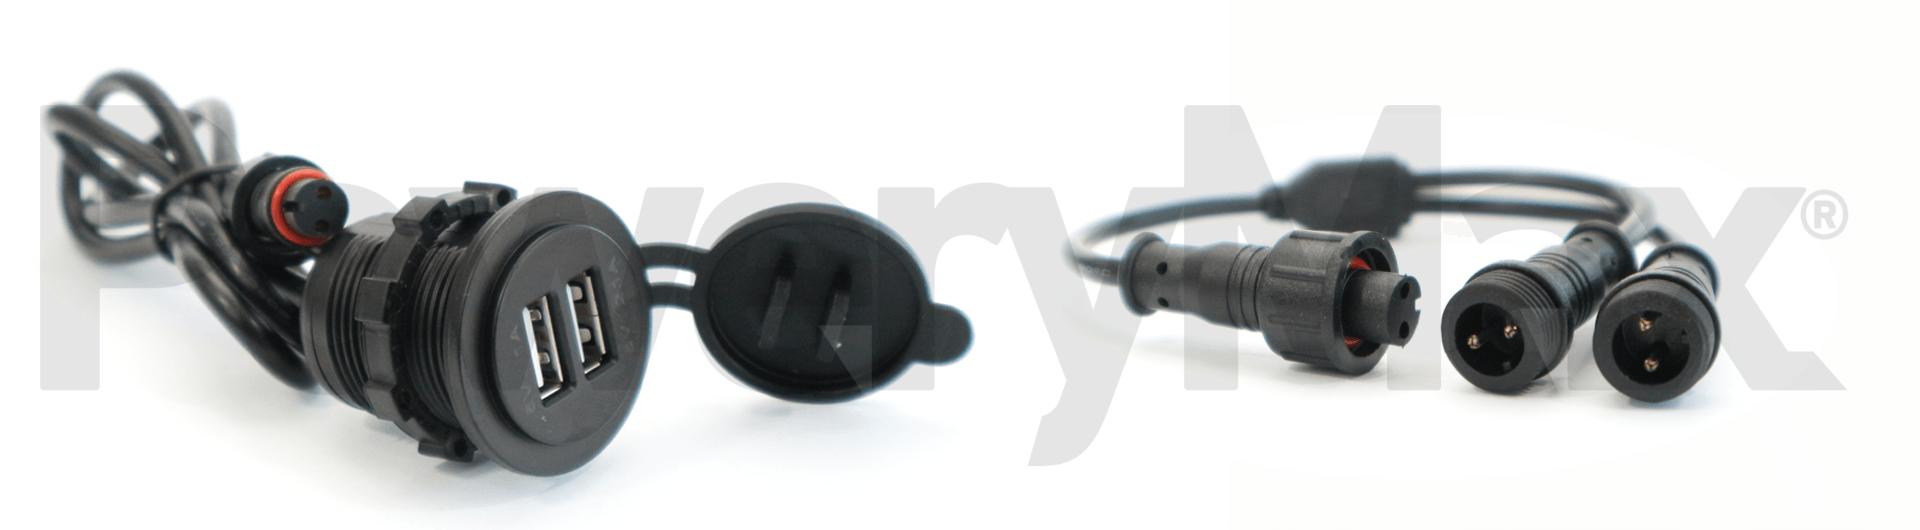 PoweryMax Kit USB-Y